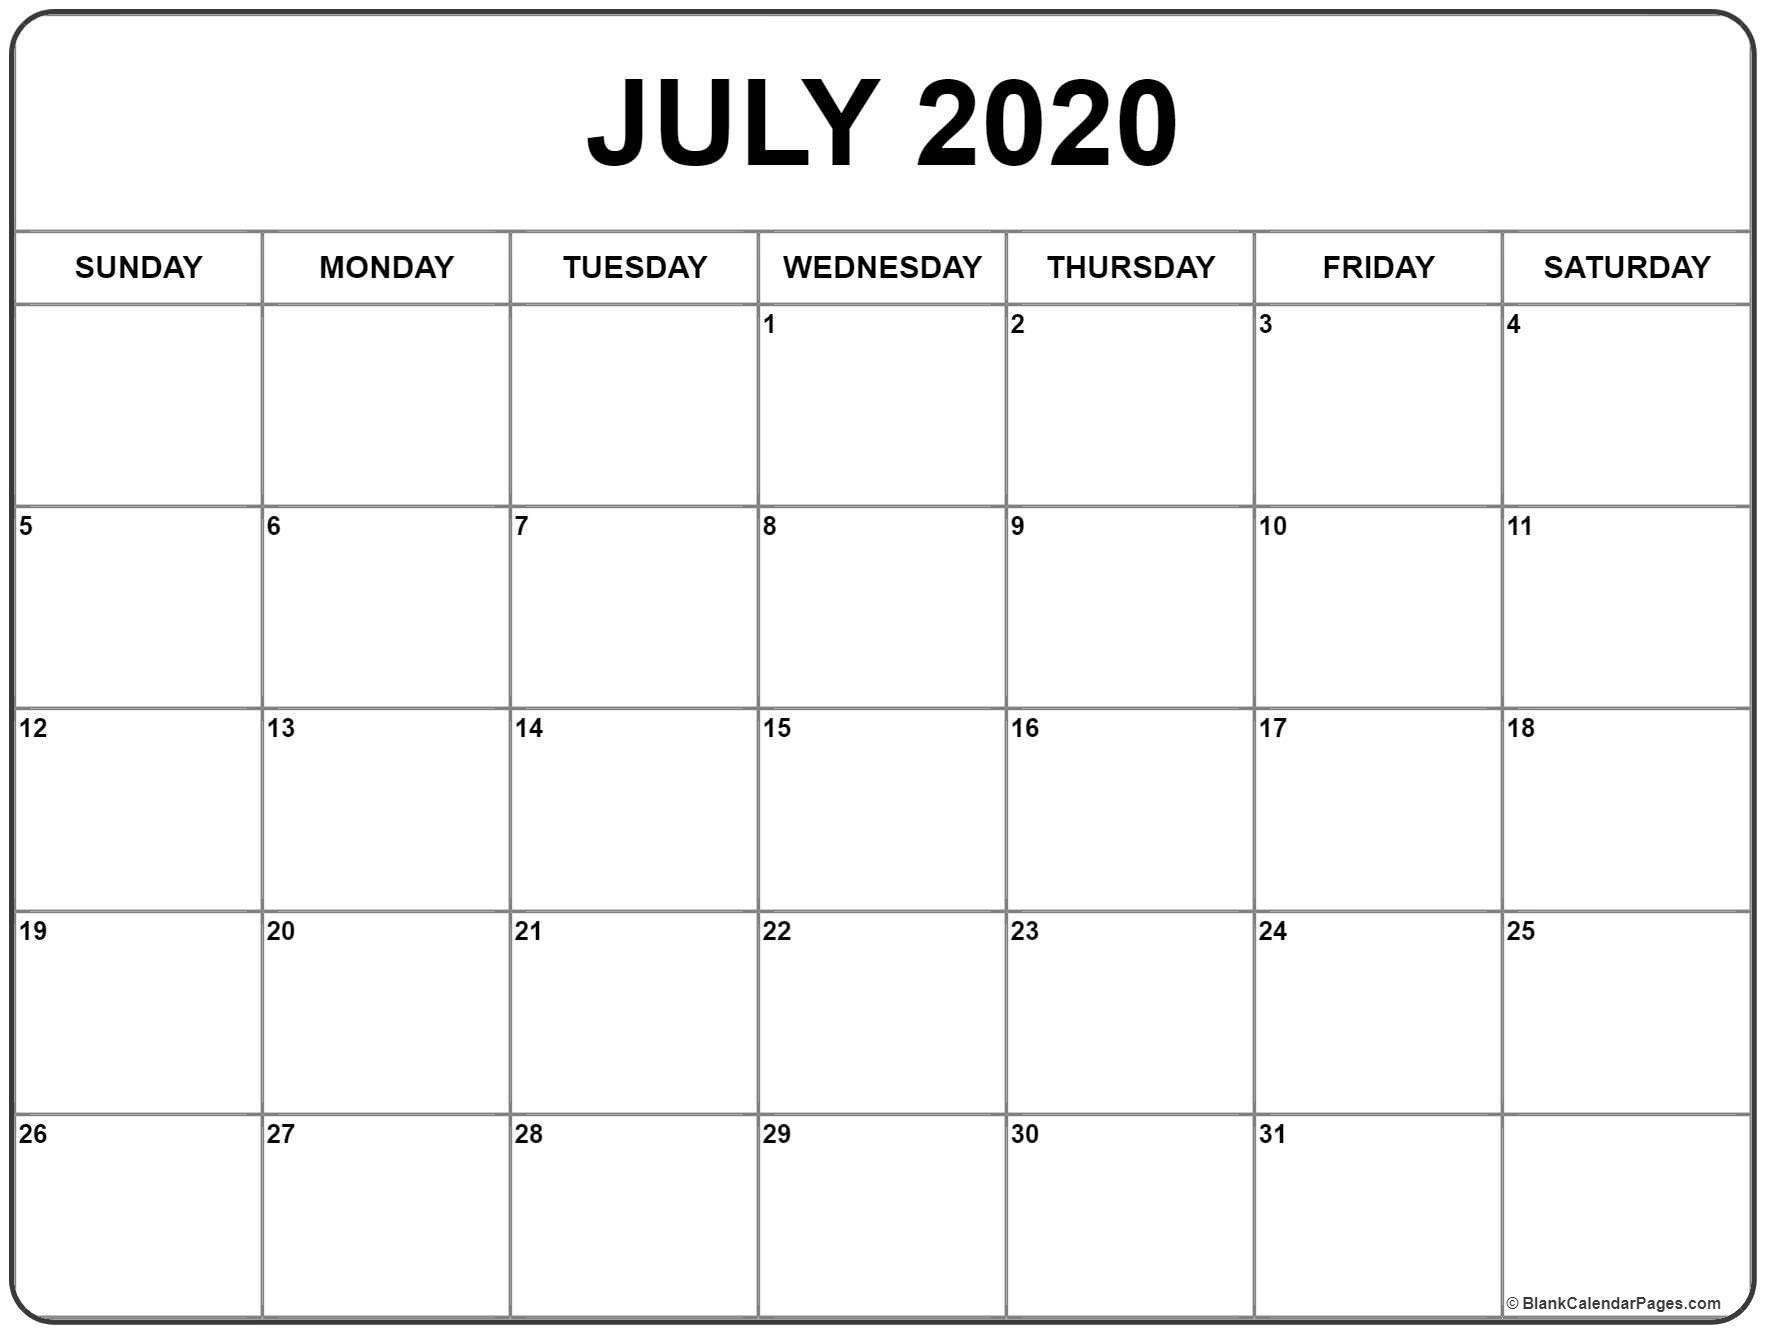 July 2020 Calendar Printable.July 2020 Calendar Printable Blank Calendar January